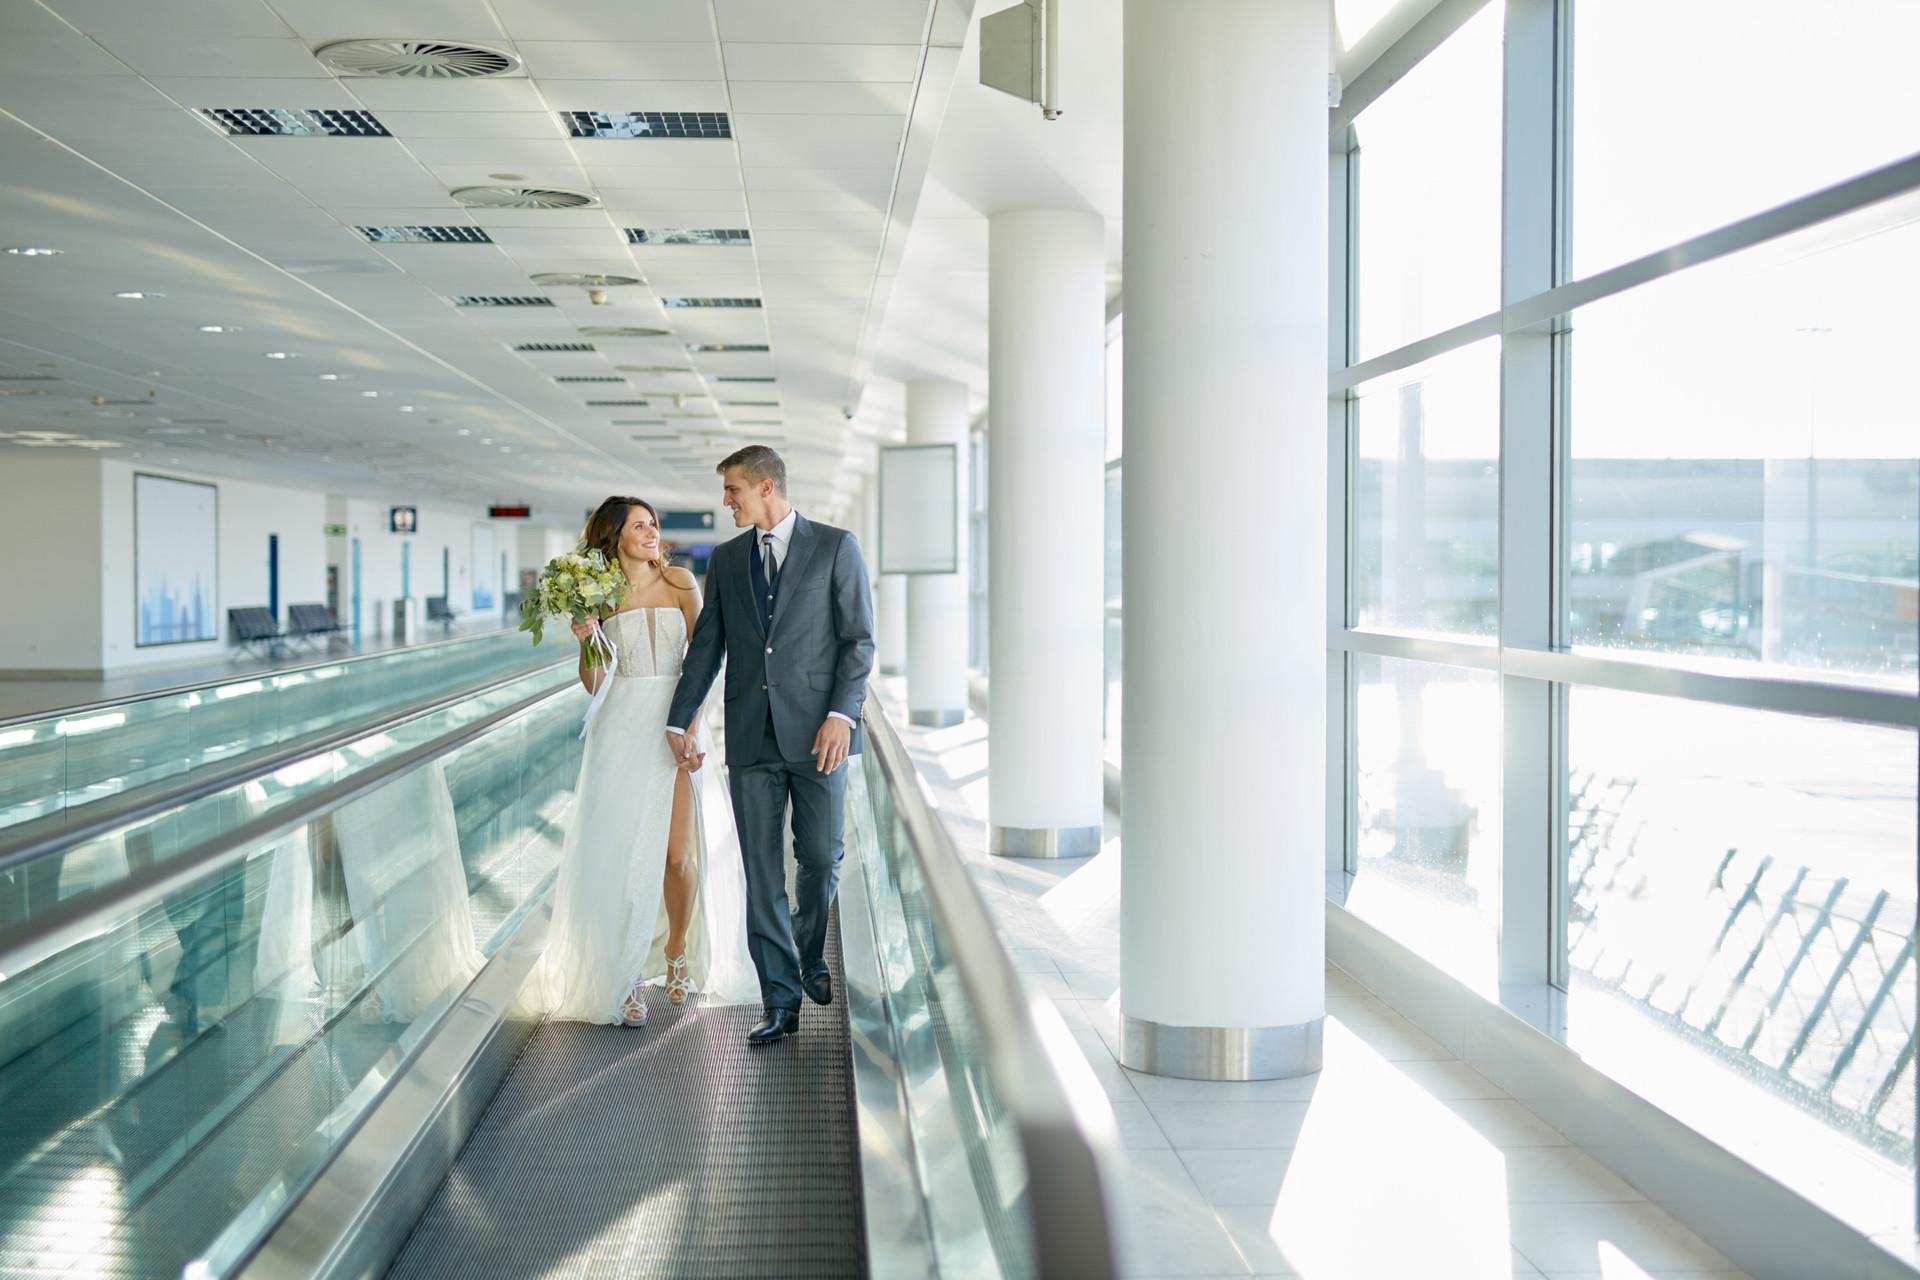 PRG Airport-Svatebni editorial 100.jpg